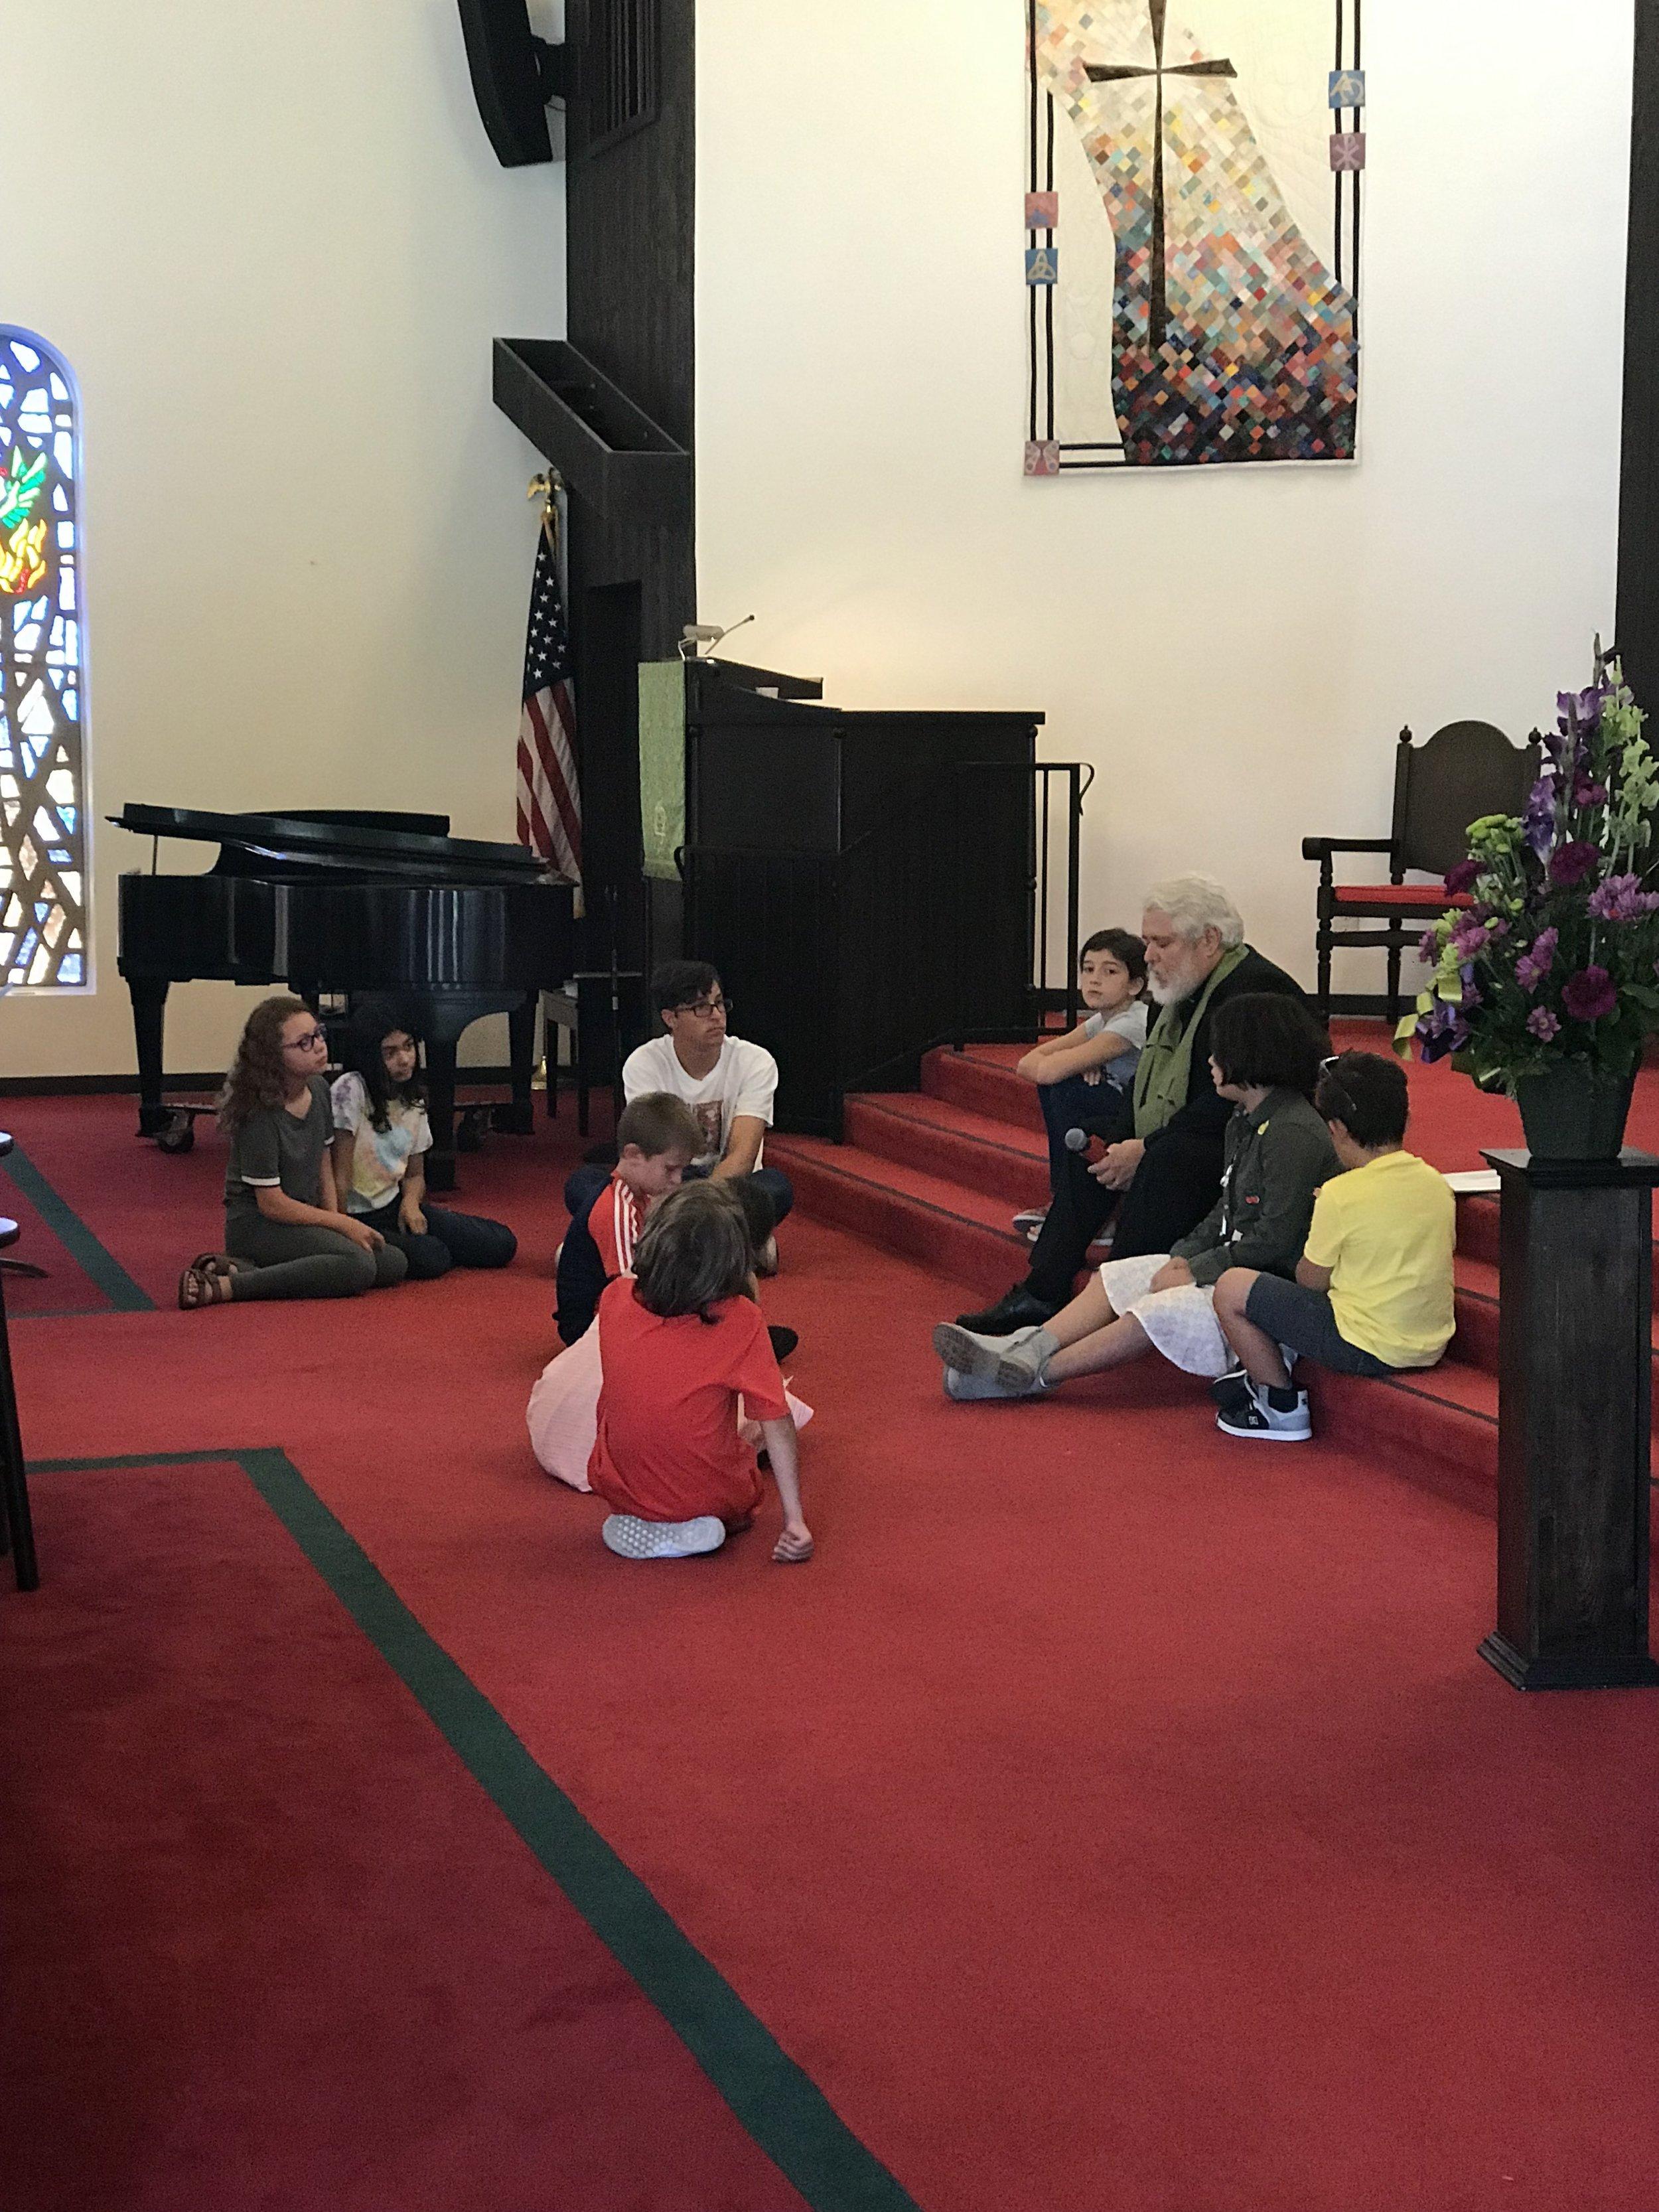 Kids in Sanctuary with John 2.jpg